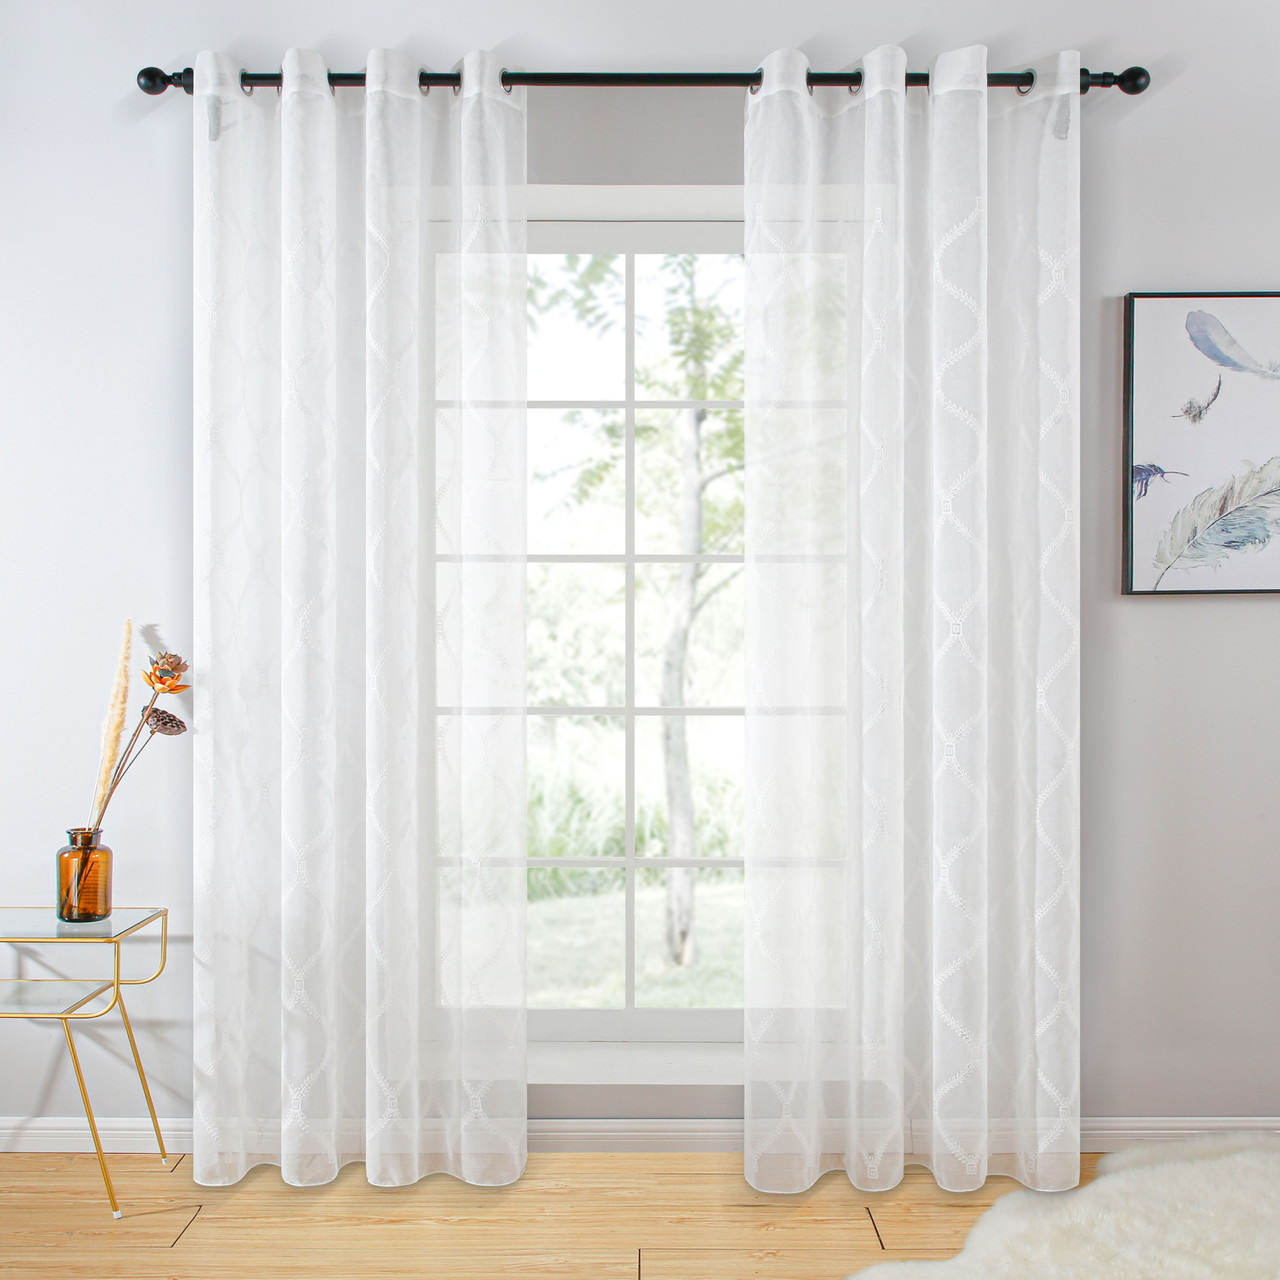 Sheer Curtain Panel Grommet-Top Window Treatments DMC732 Dolce Mela 8171460152454